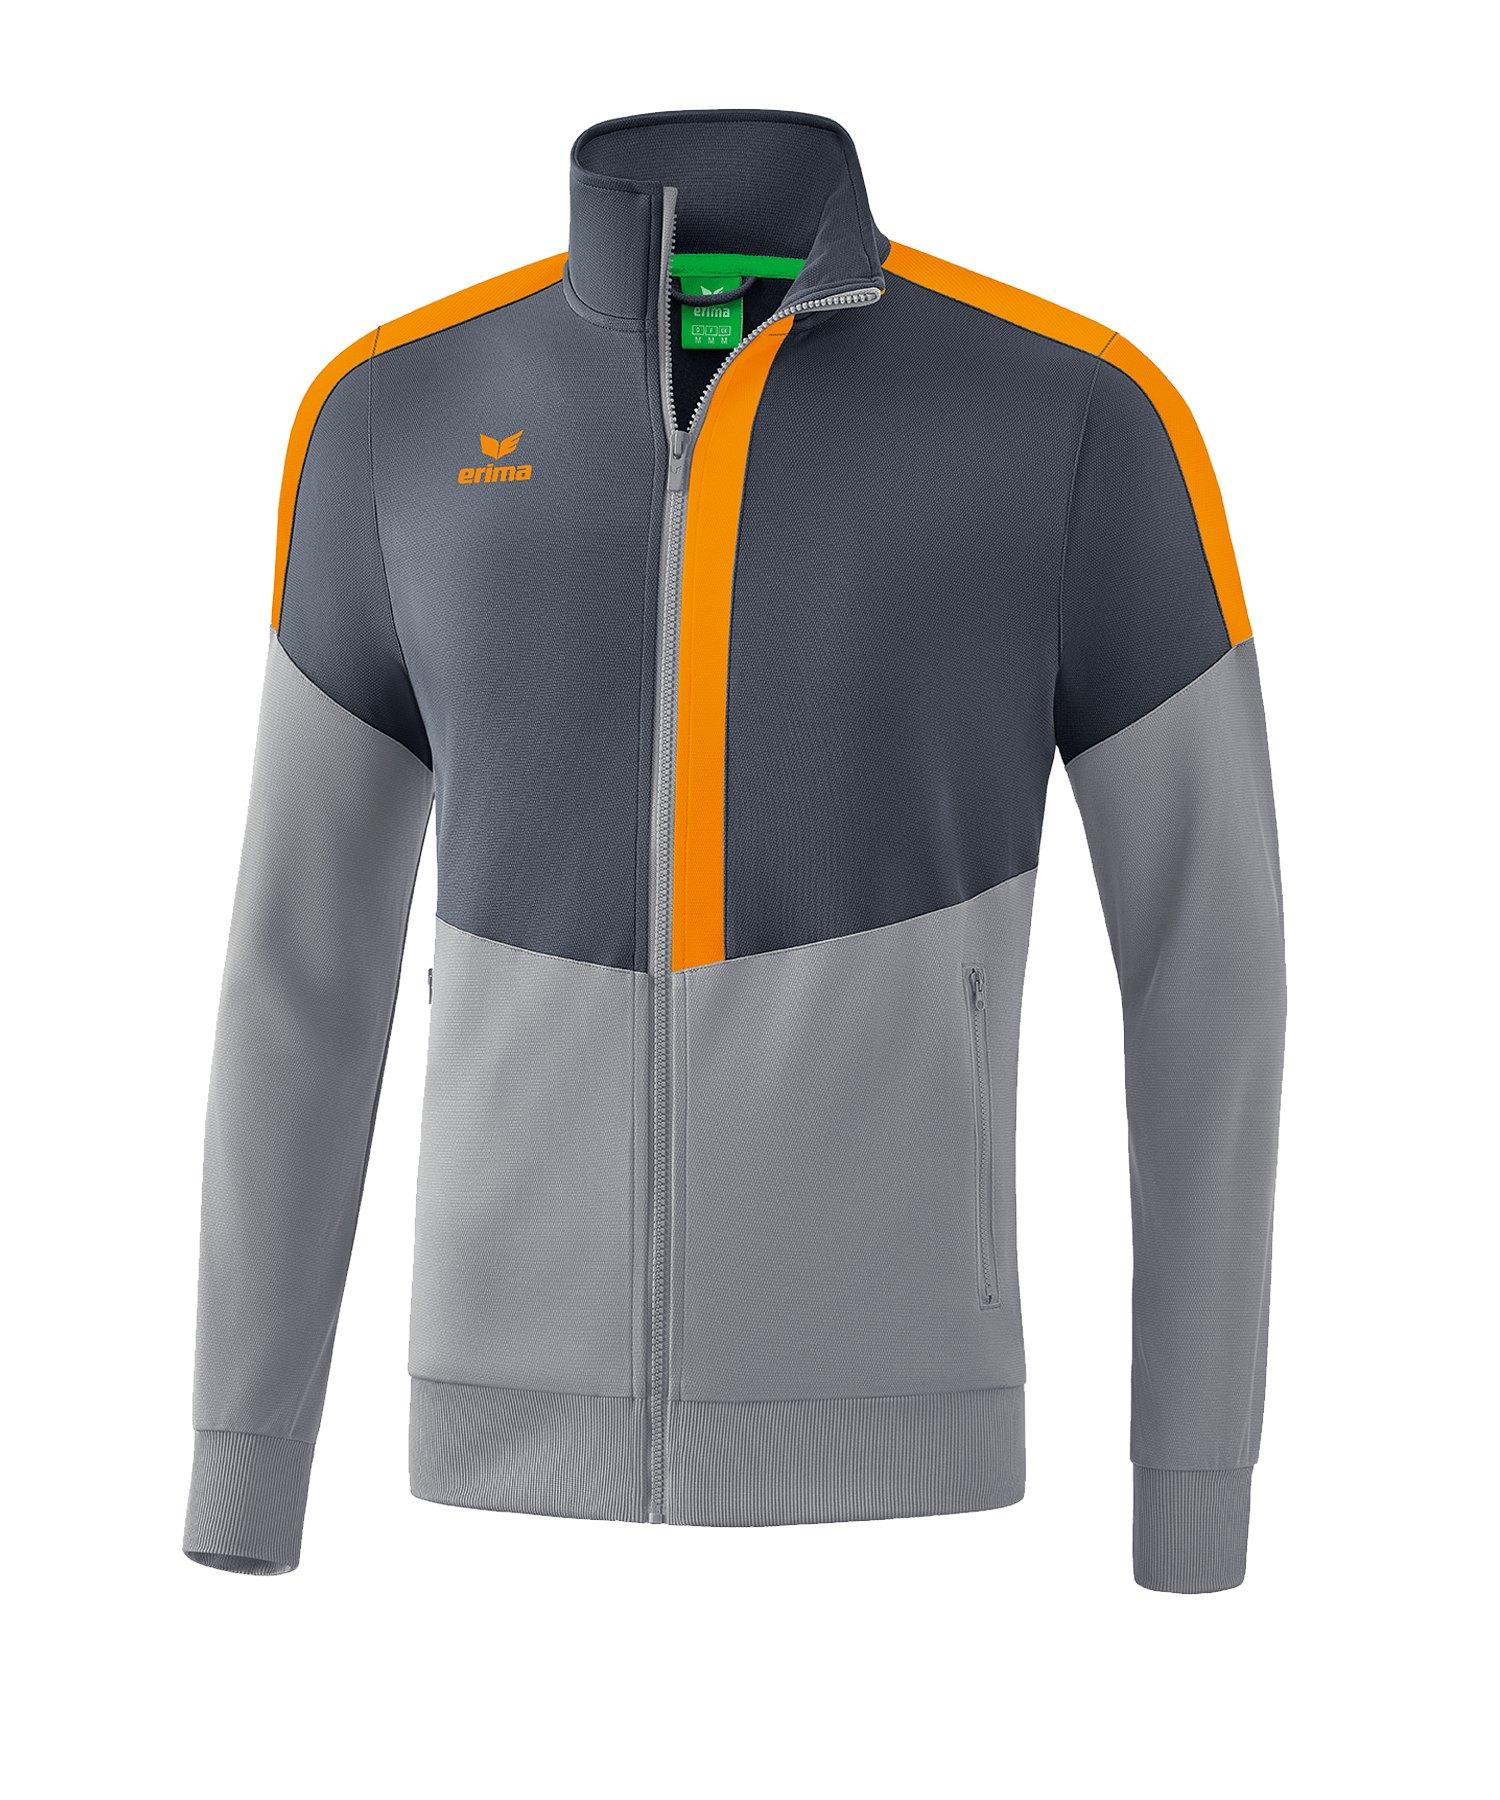 Erima Squad Trainingsjacke Grau Orange - grau